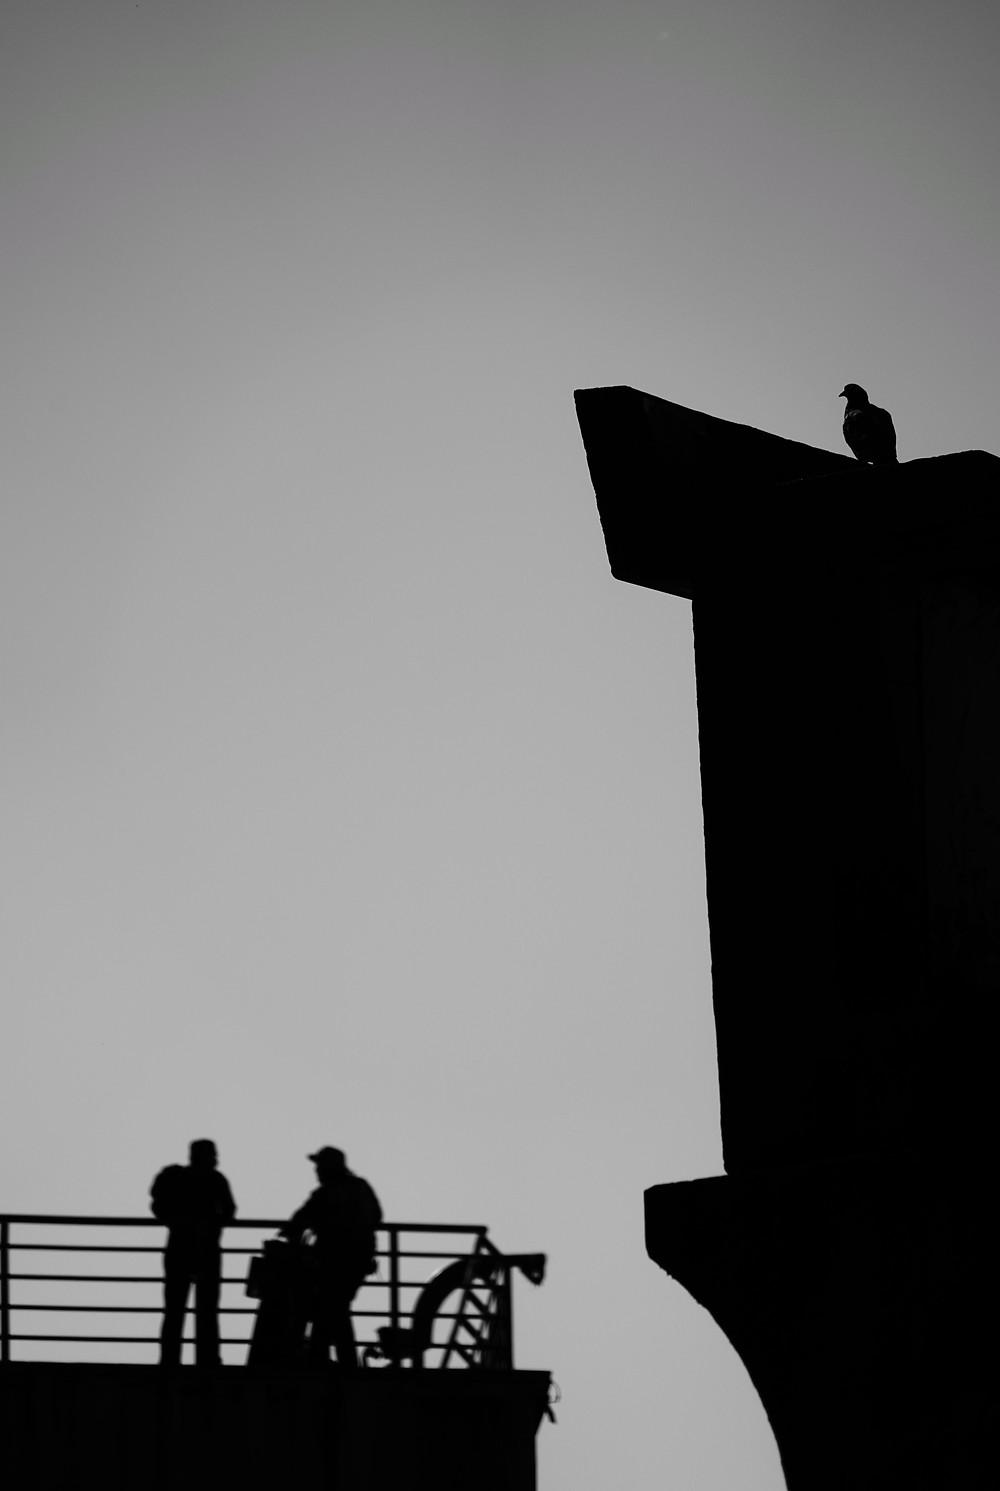 Fabio Petry winning photography